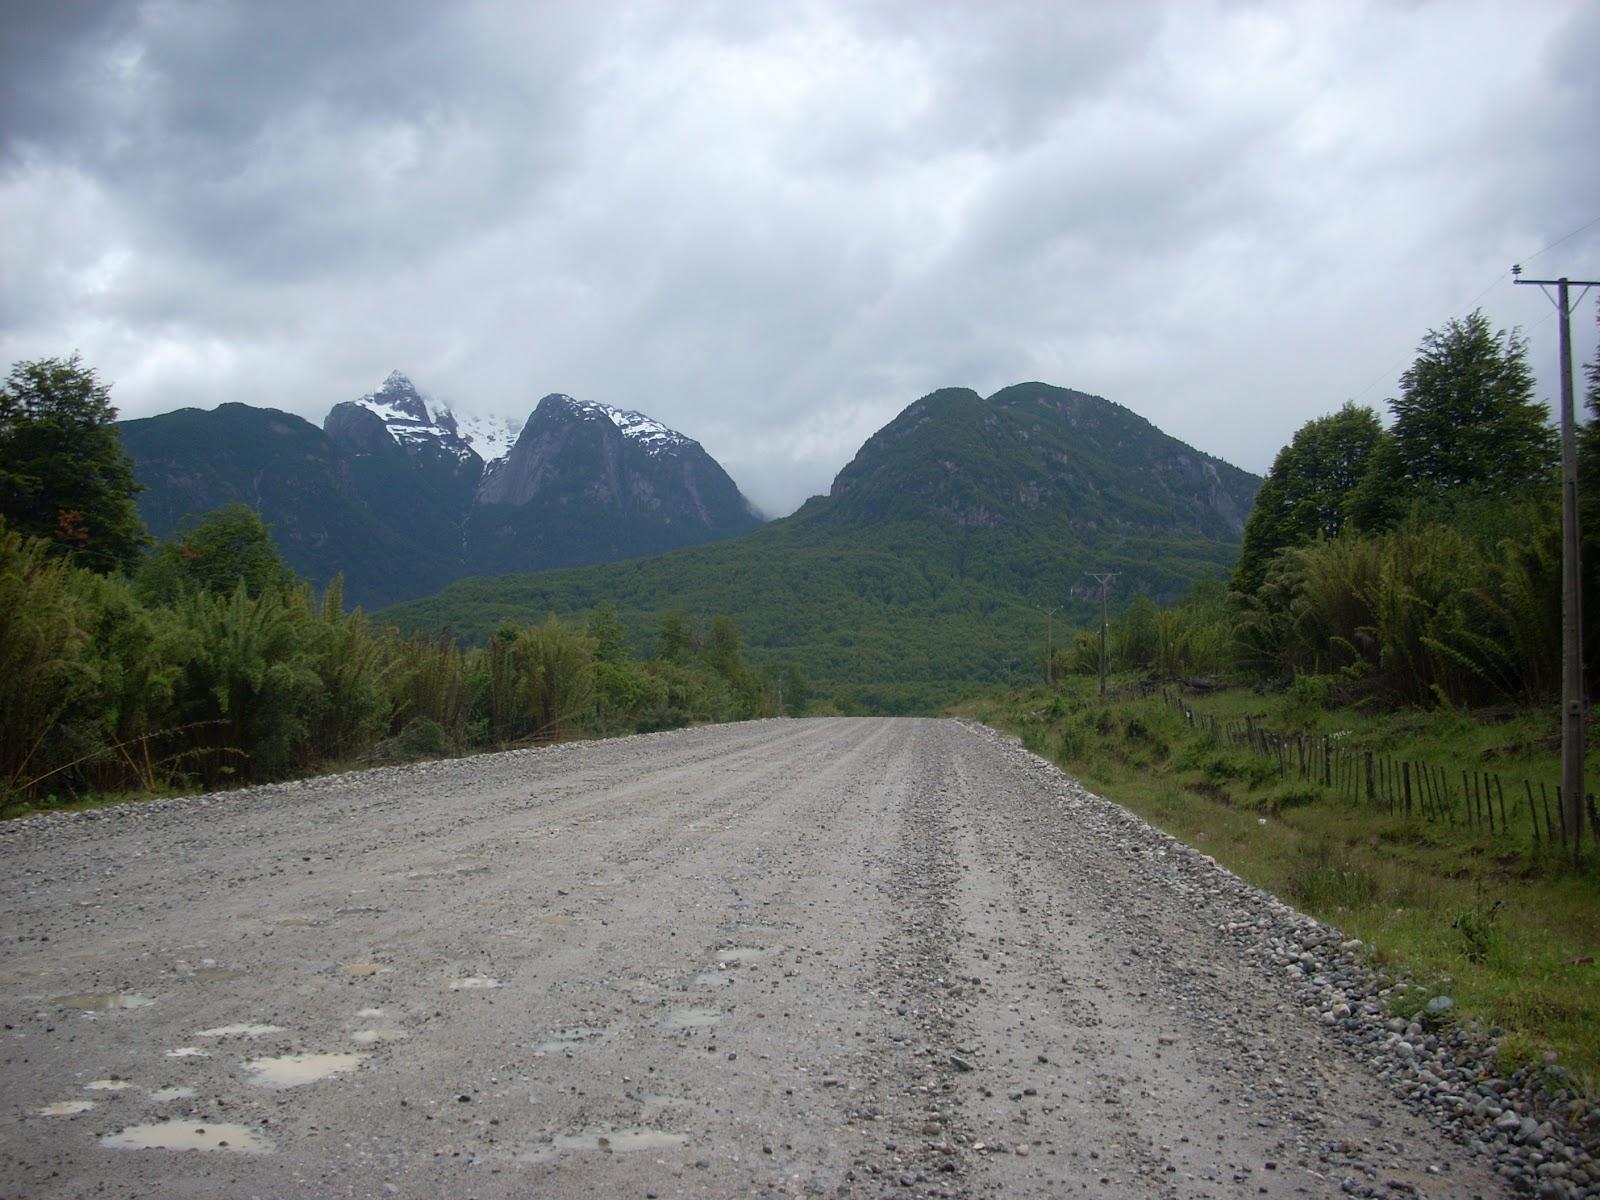 Dirt roads again